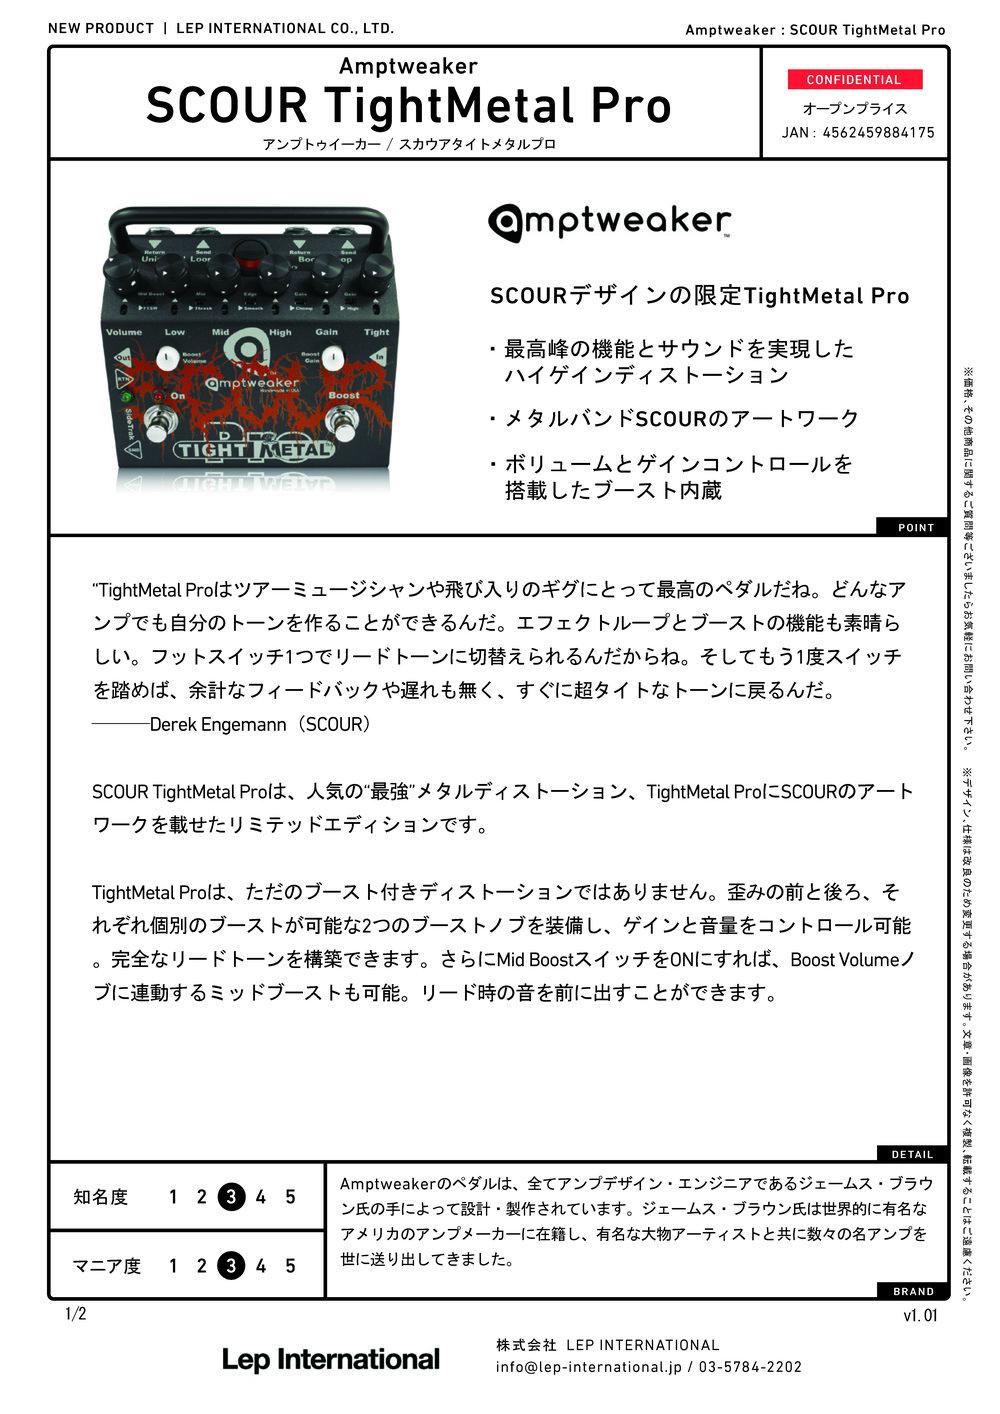 amptweaker scourtightmetalpro v1.01_ページ_1.jpg